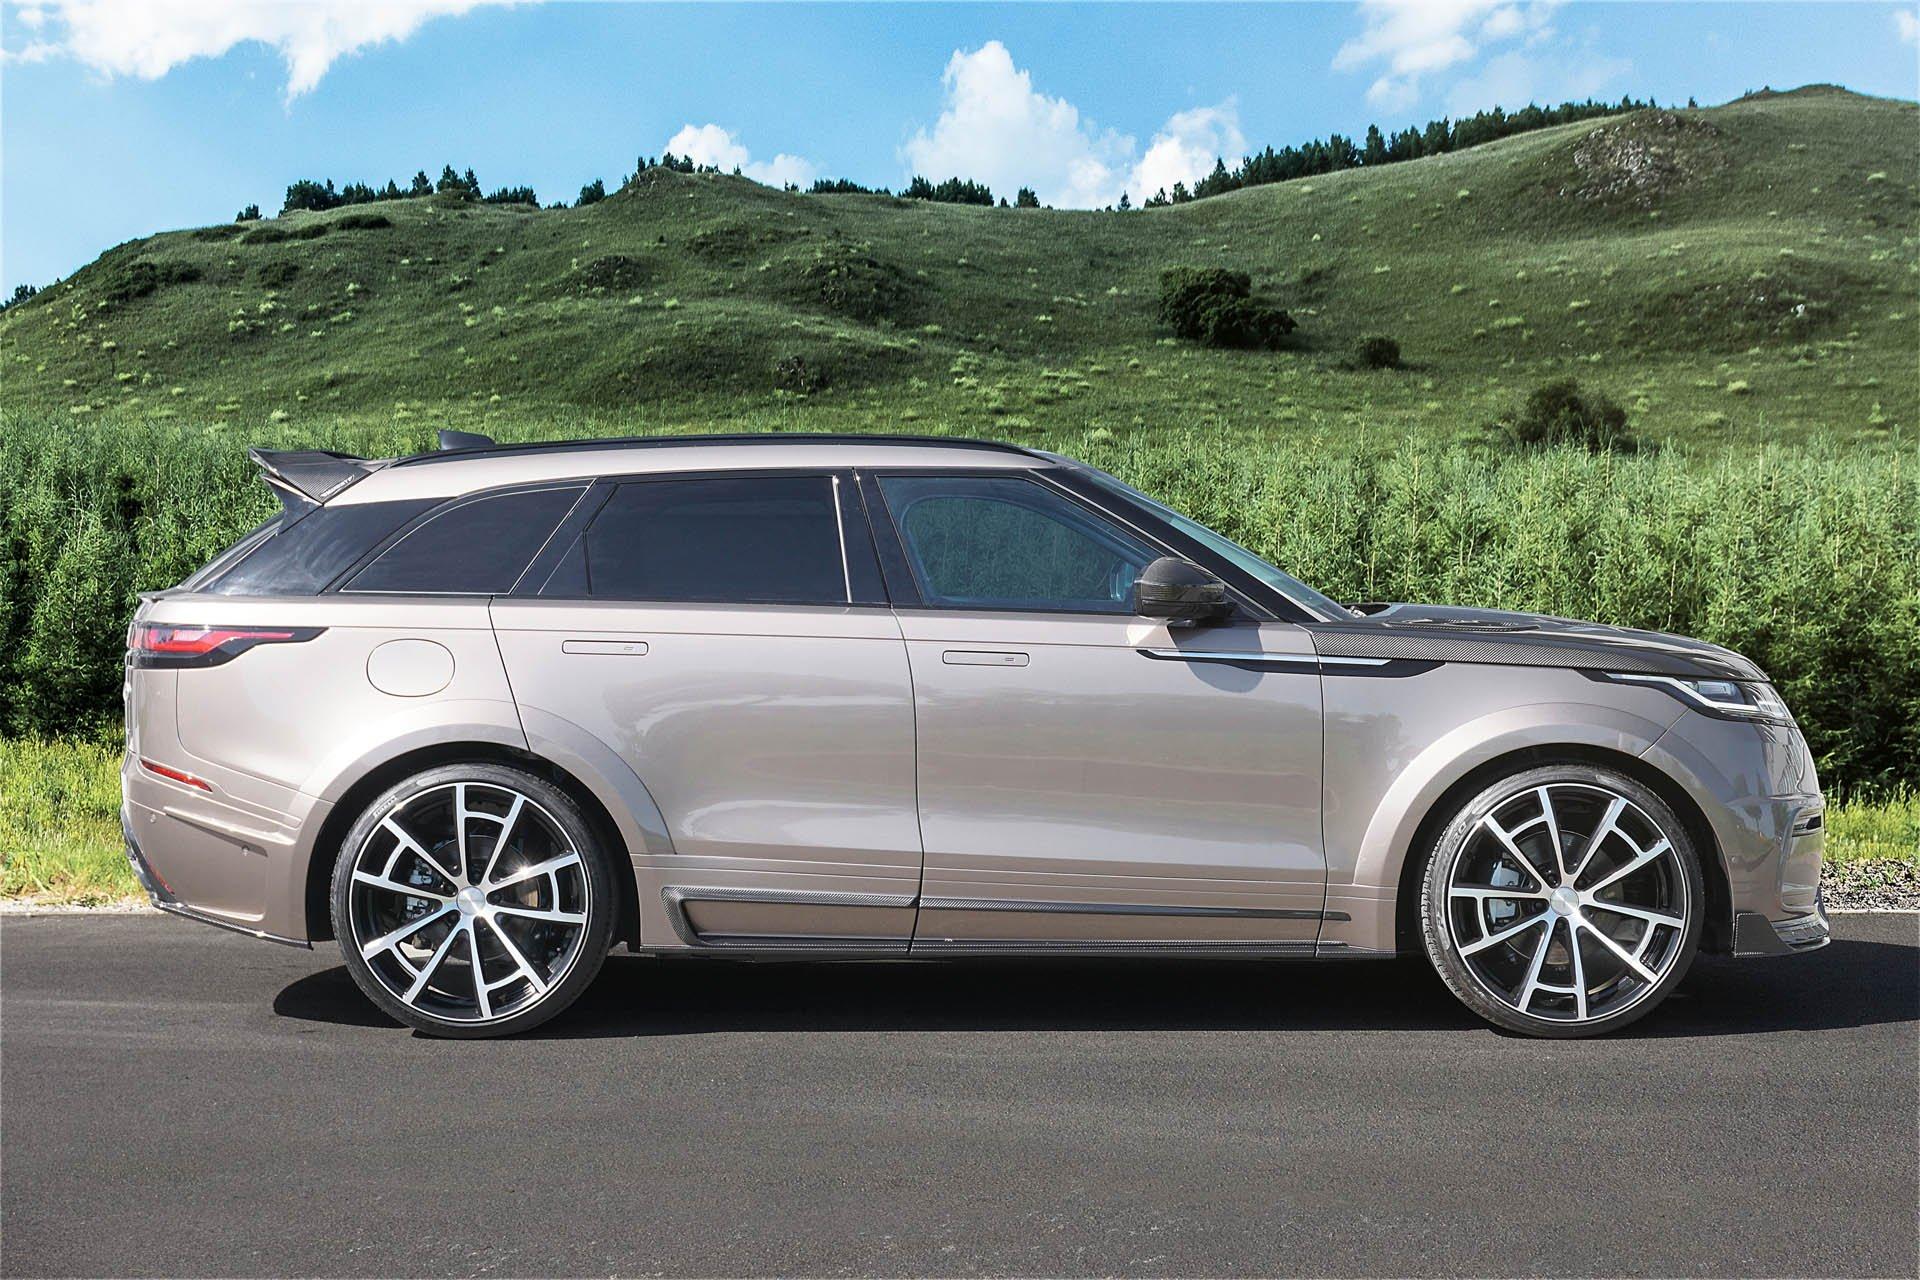 Range Rover Velar by Mansory (3)